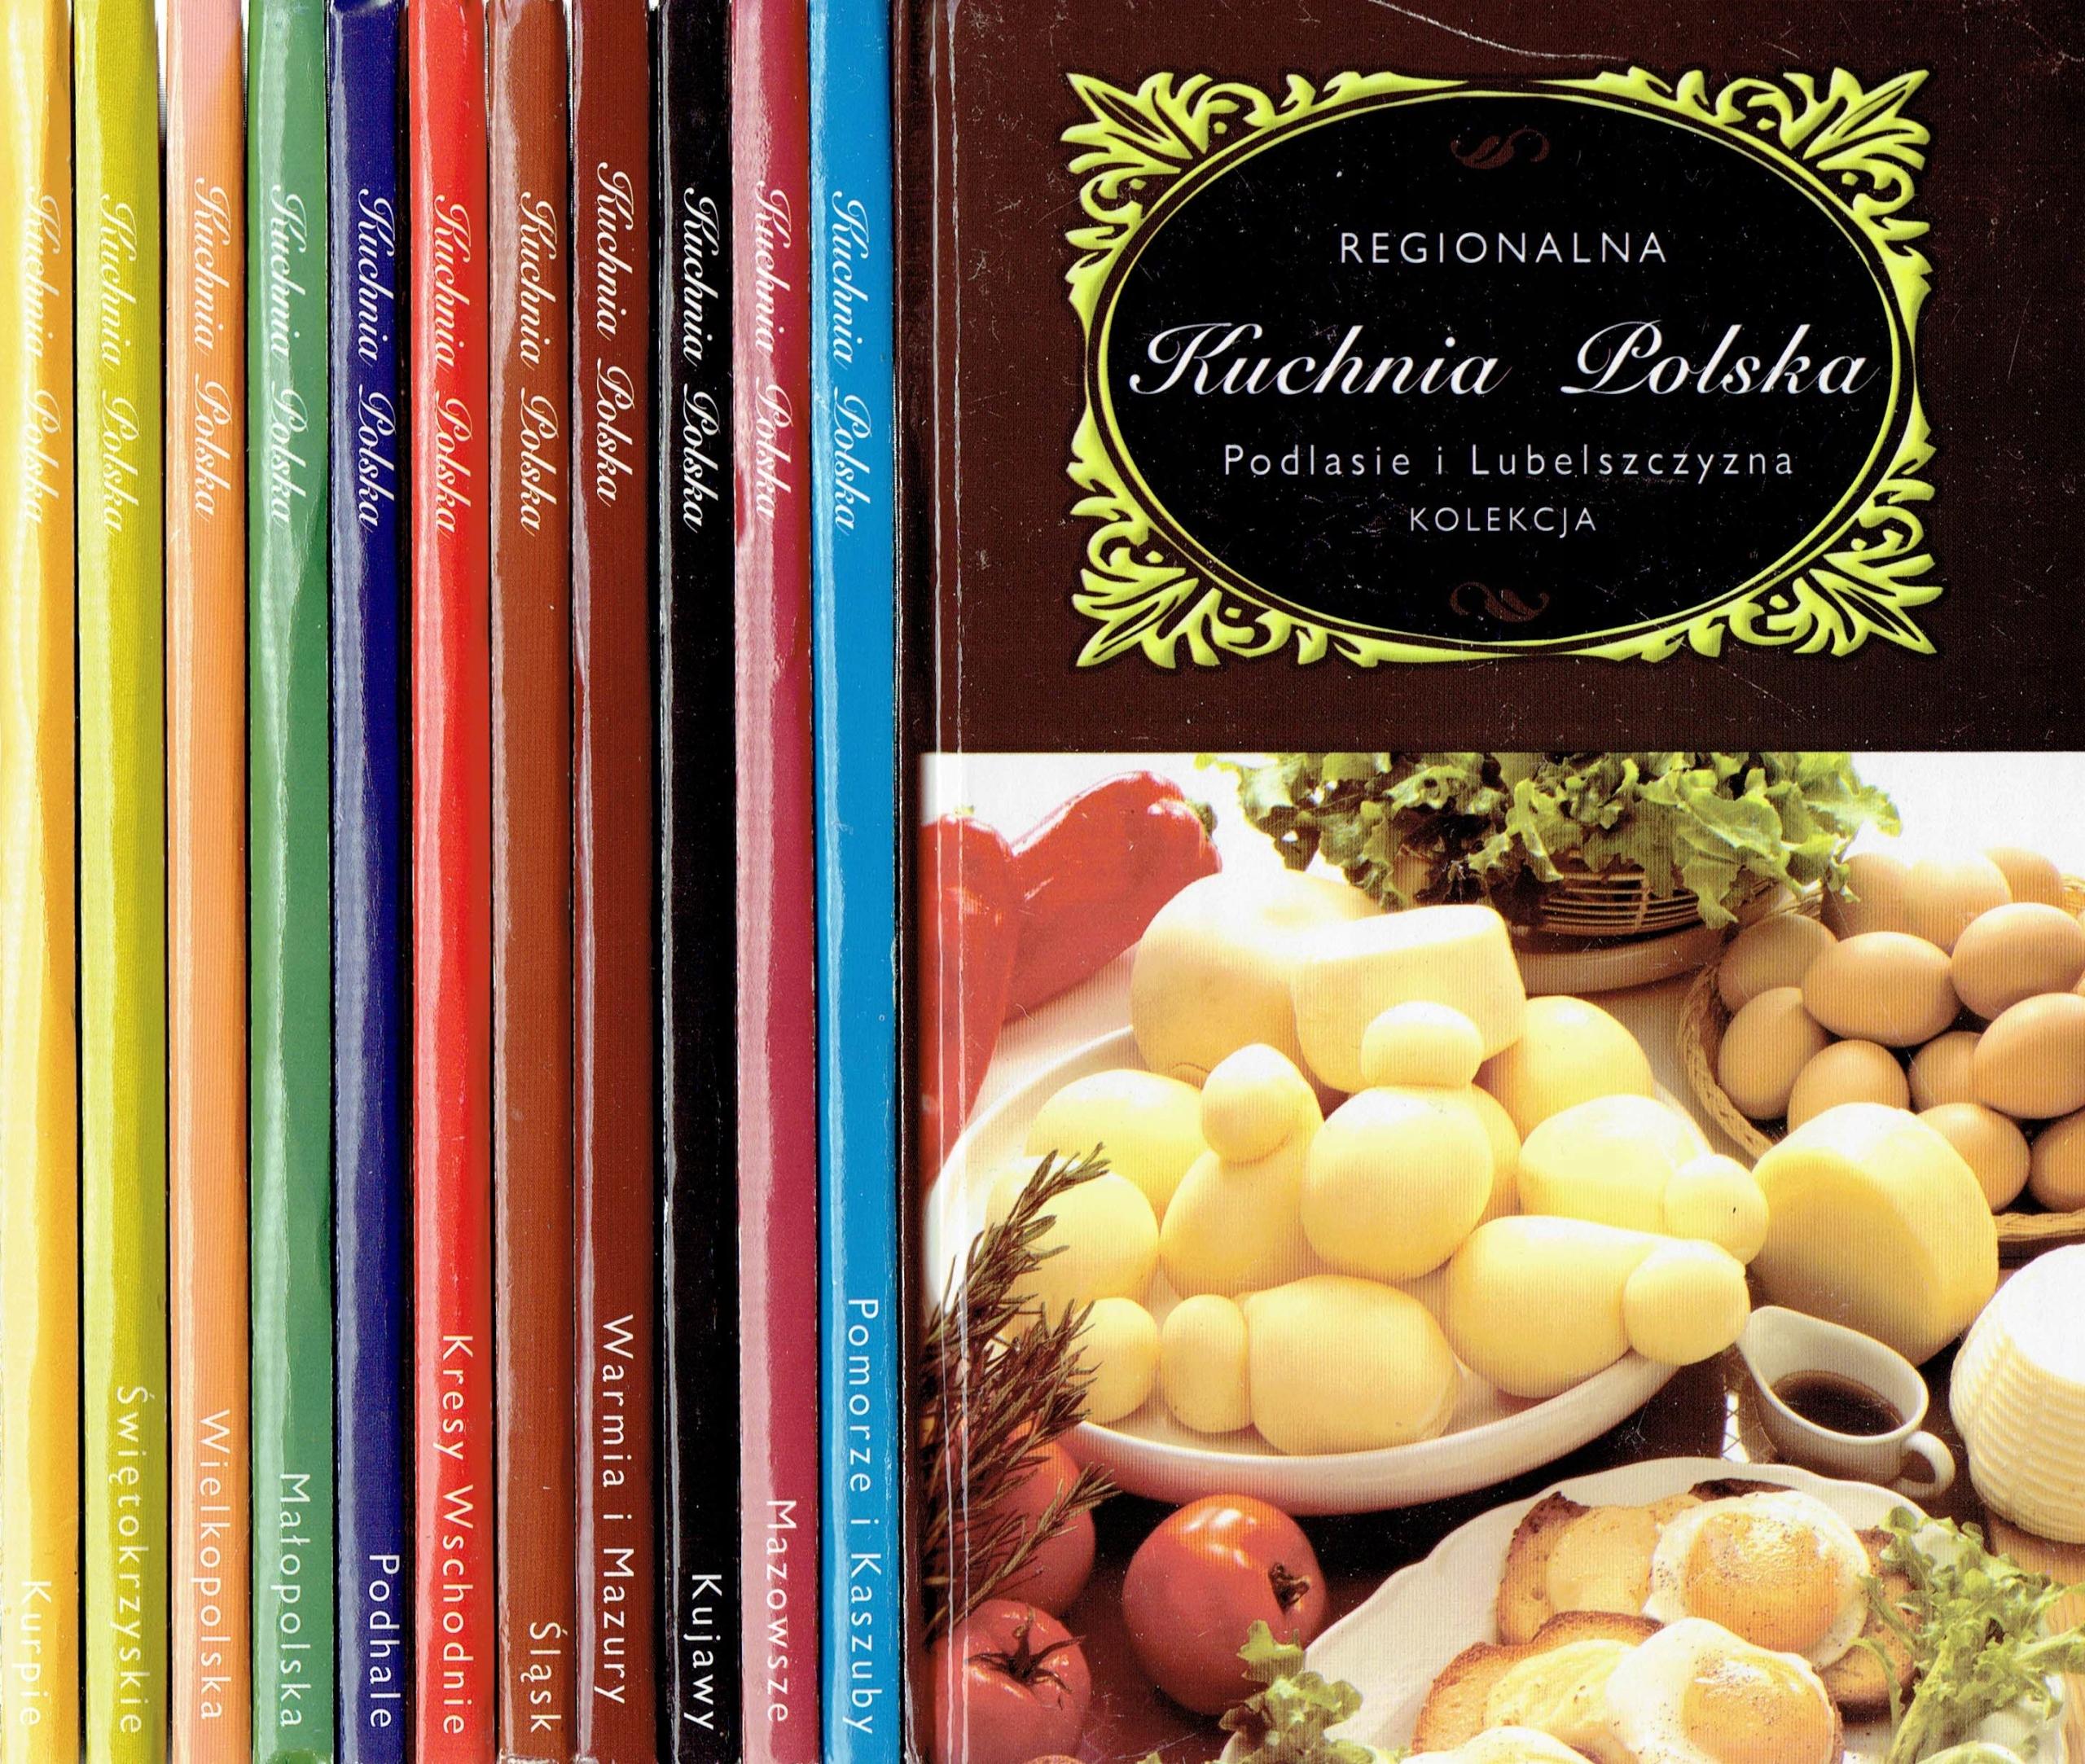 Regionalna Kuchnia Polska Kolekcja 12 Książek 7888249445